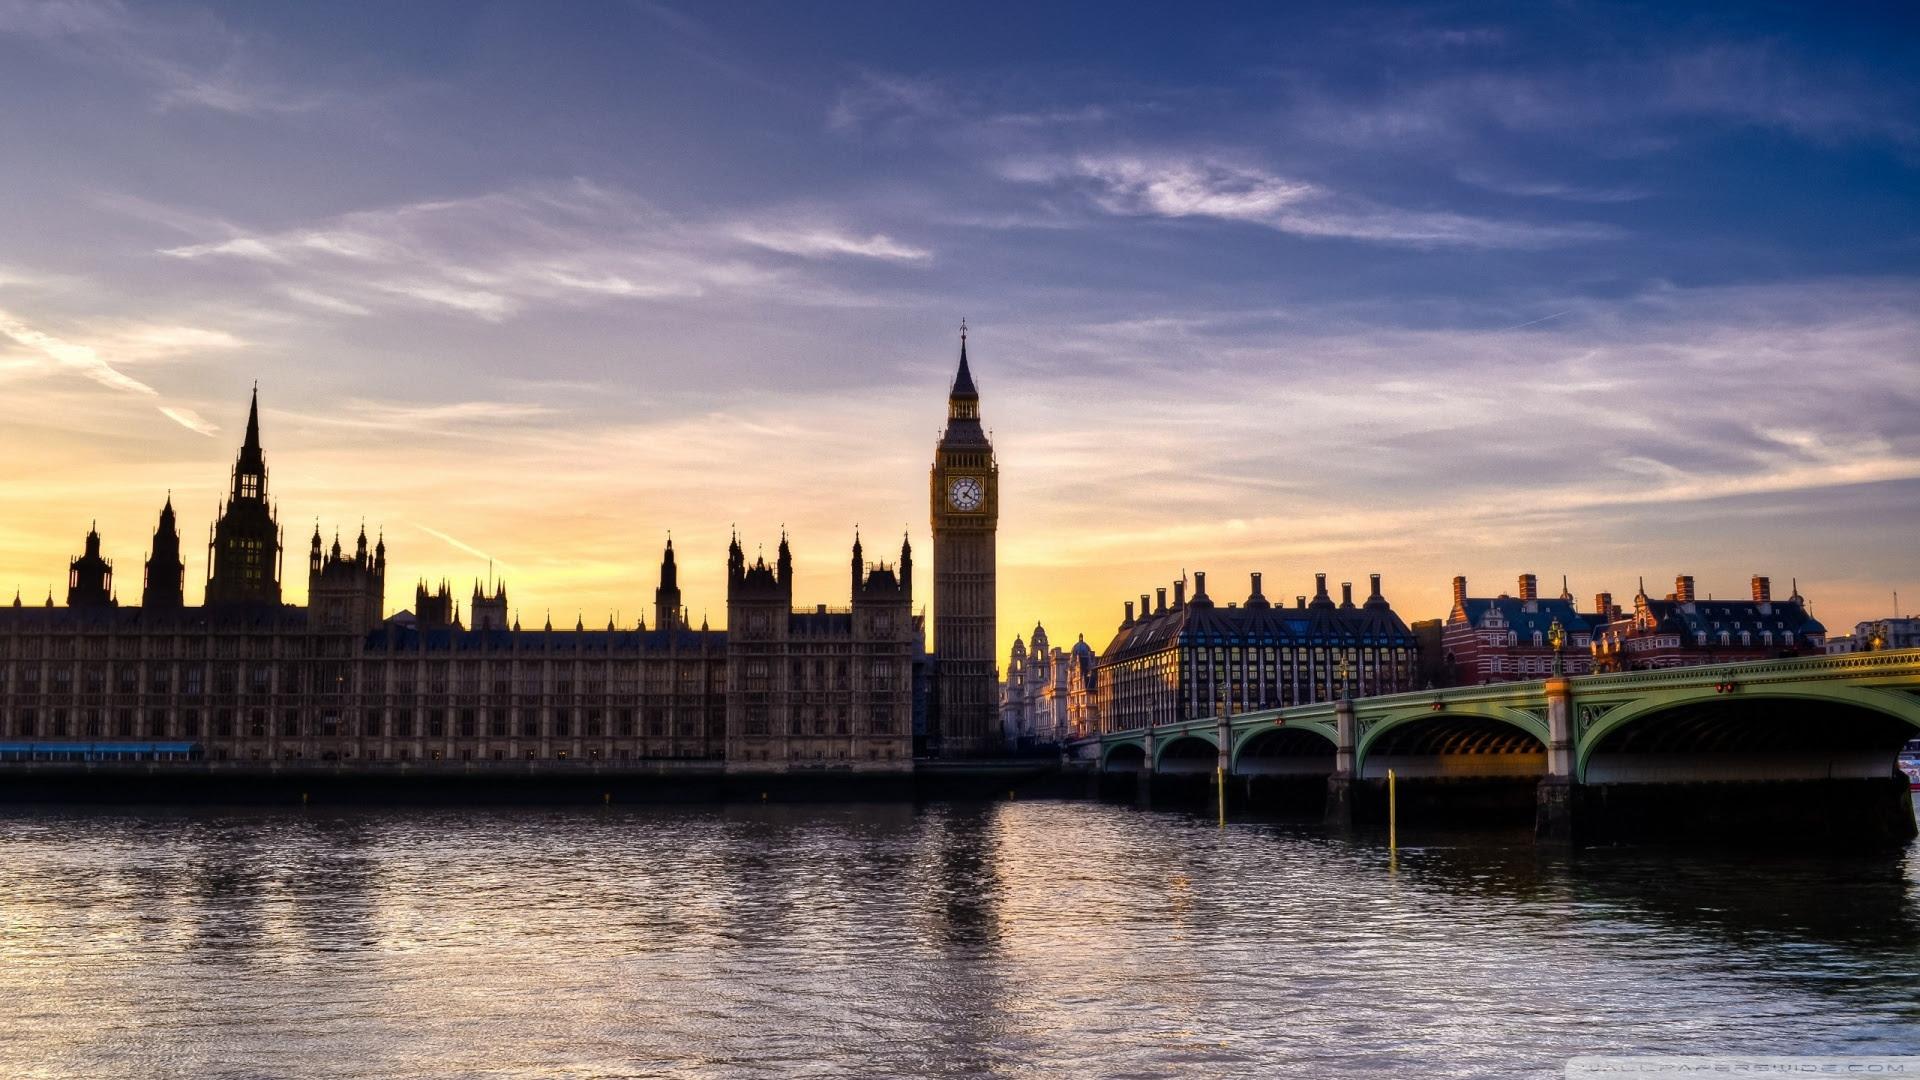 London HD wallpaper  1920x1080  21599